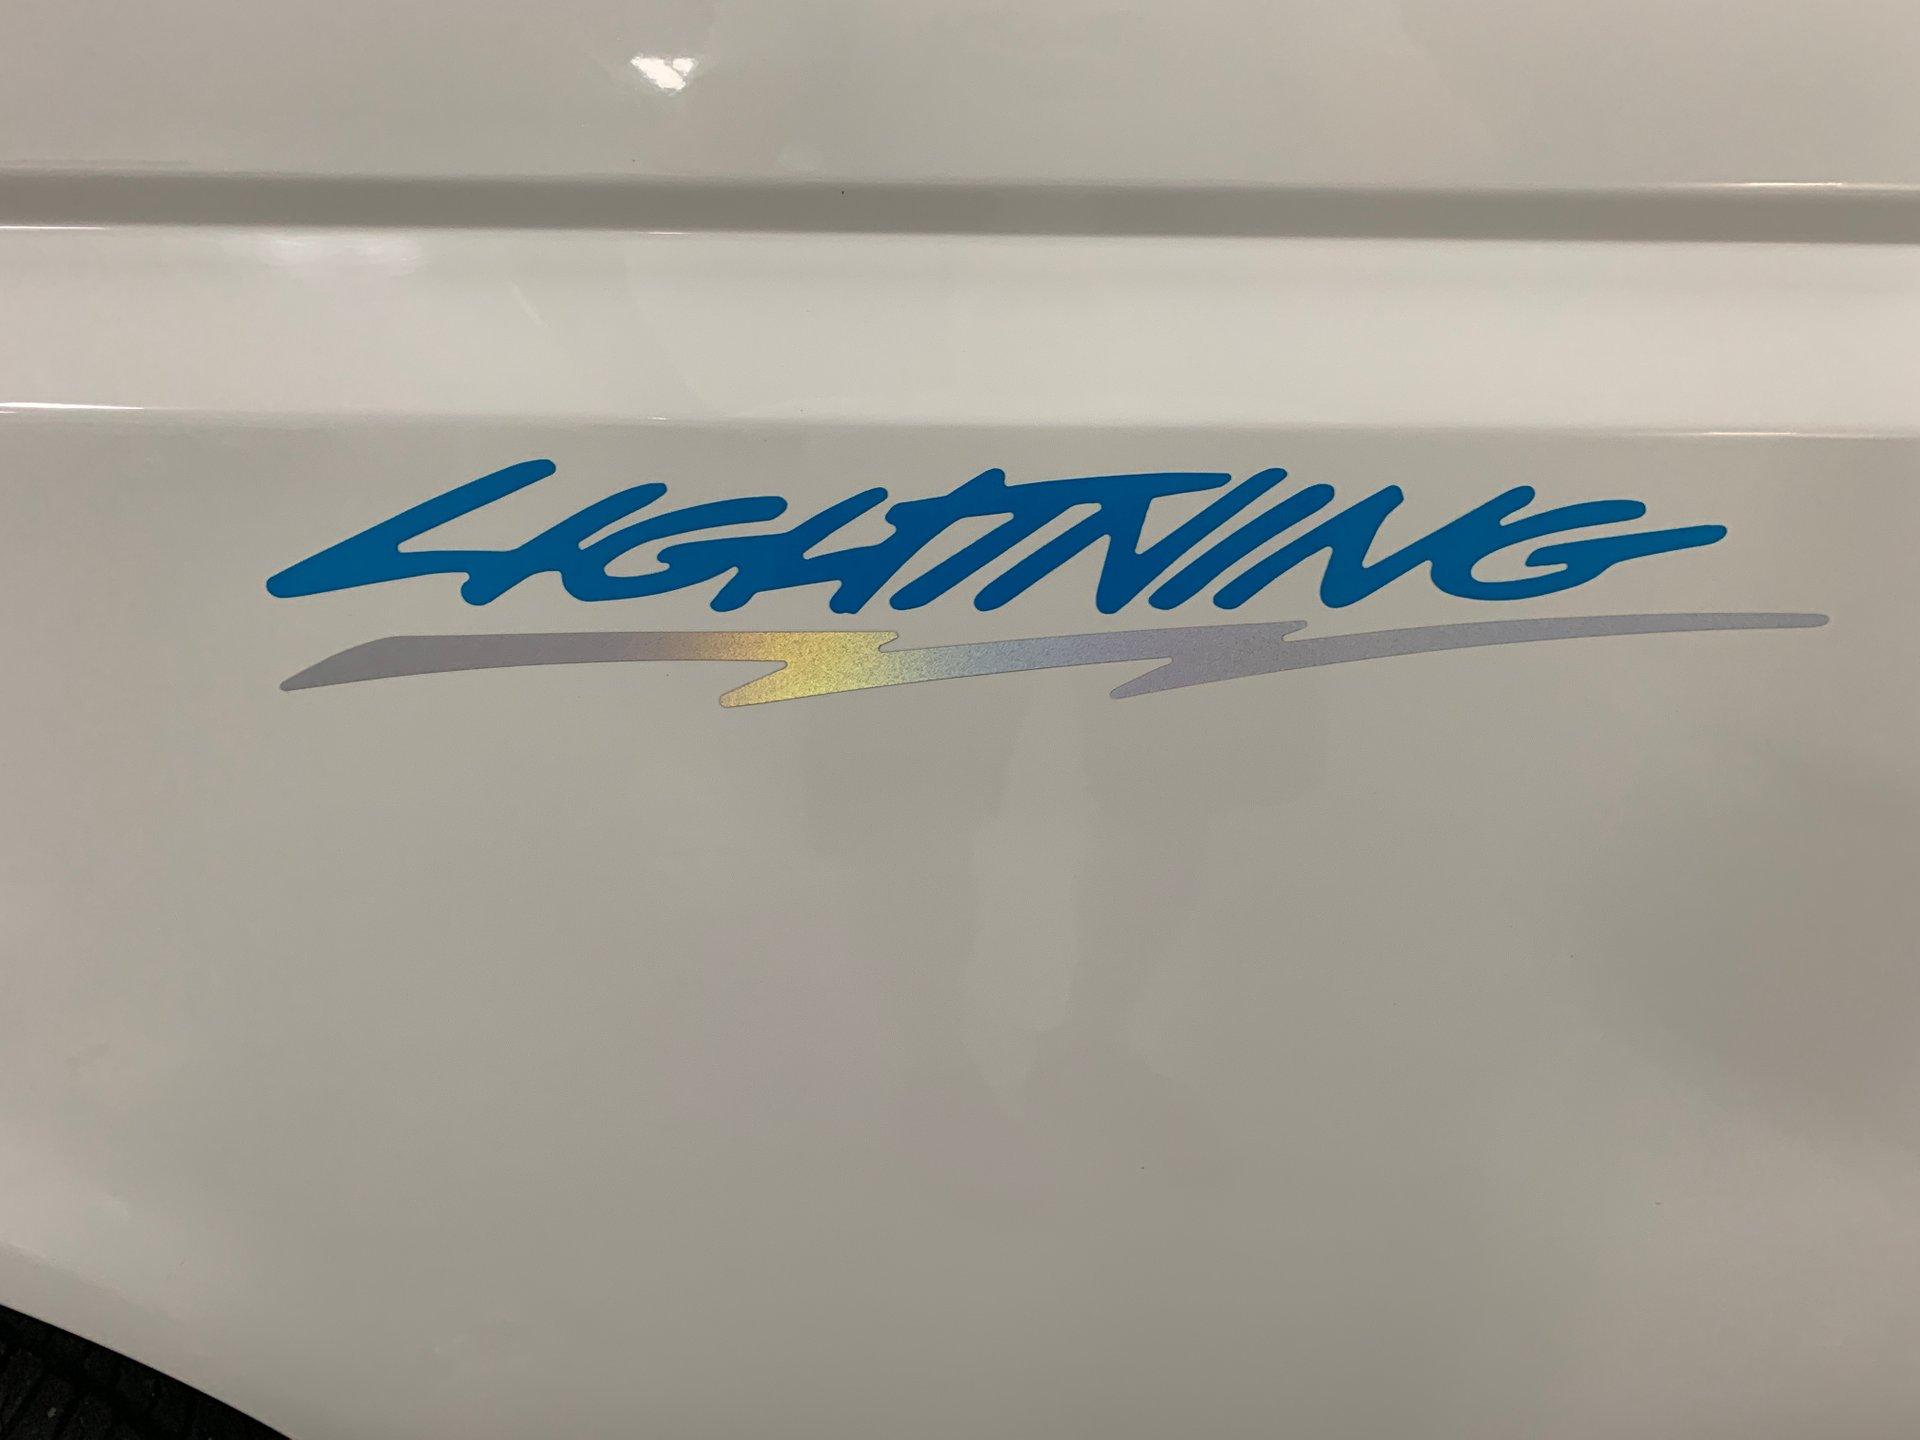 1994 Ford Lightning | 4-Wheel Classics/Classic Car, Truck